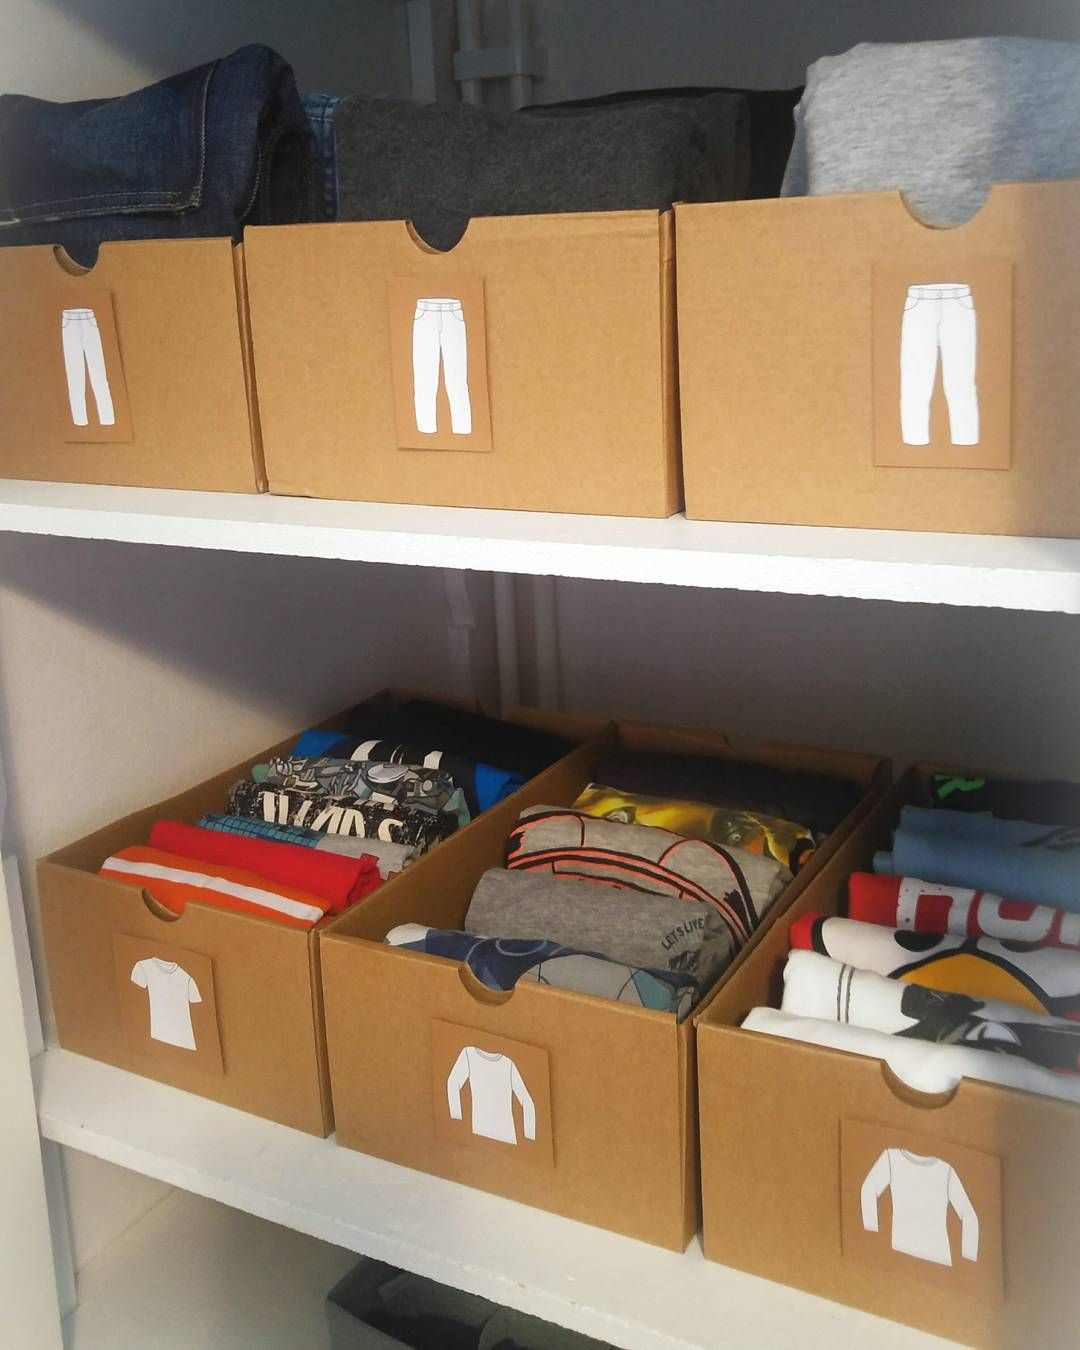 garde robe chambre enfant pinterest garde robe rangement et organisation. Black Bedroom Furniture Sets. Home Design Ideas